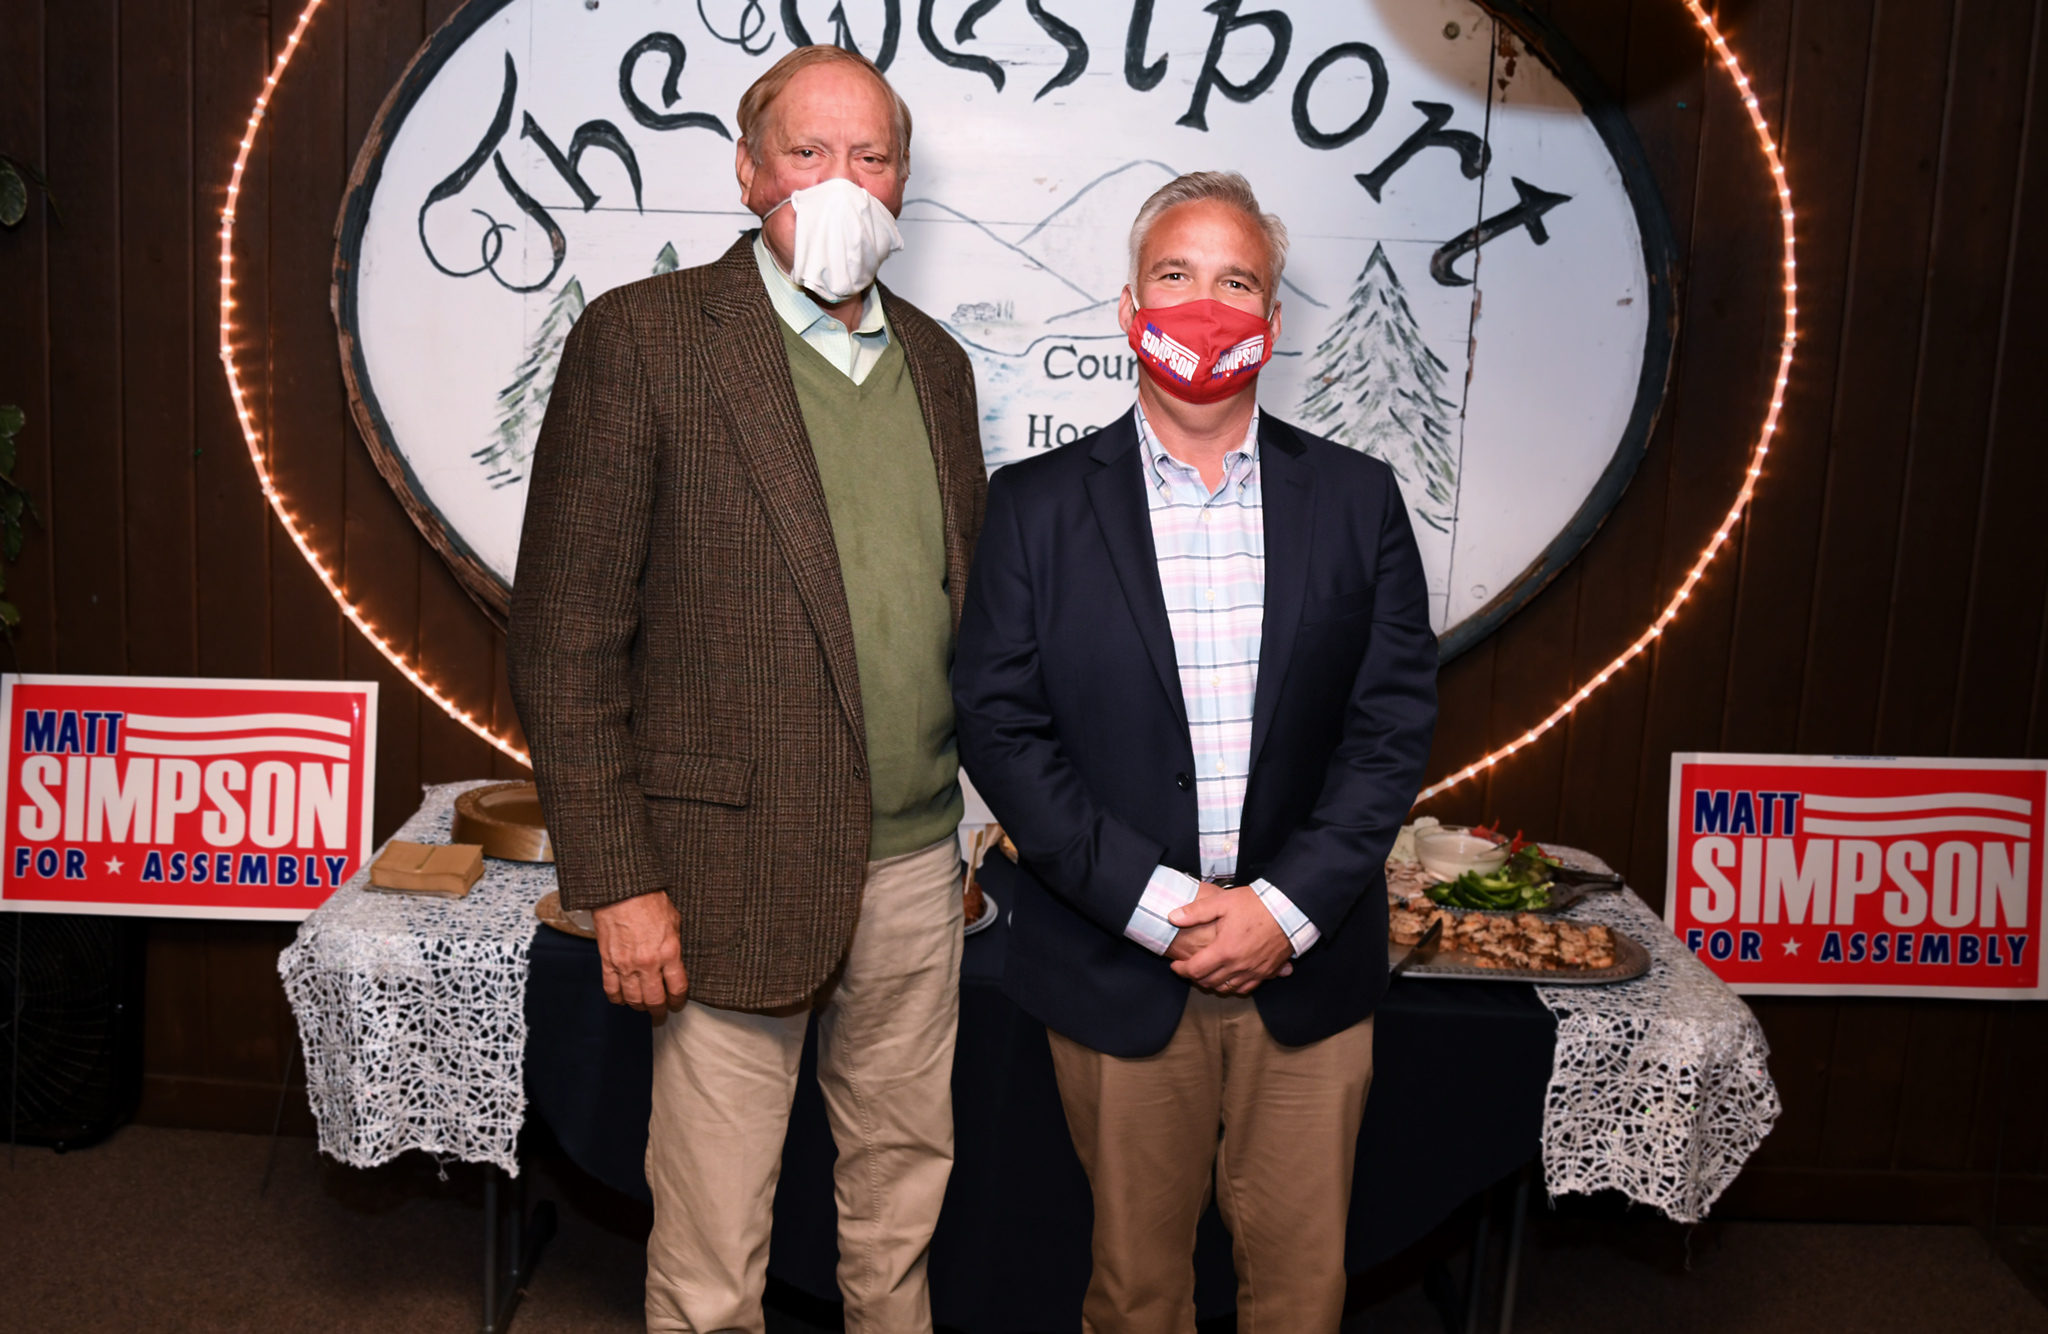 Governor George Pataki and Matt Simpson